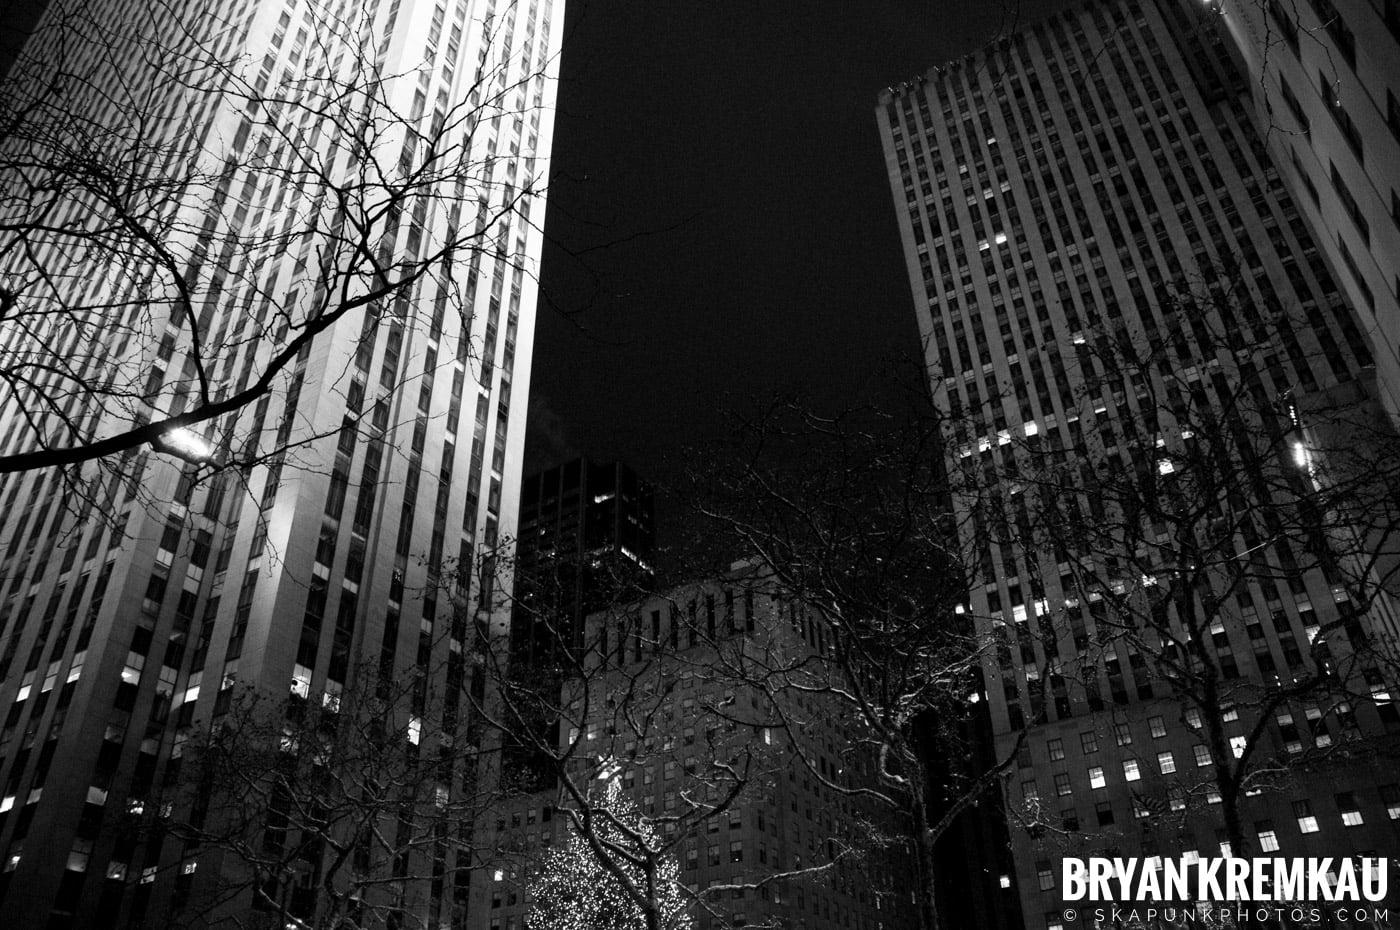 NYC Holiday Trip - 12.20.08 (15)